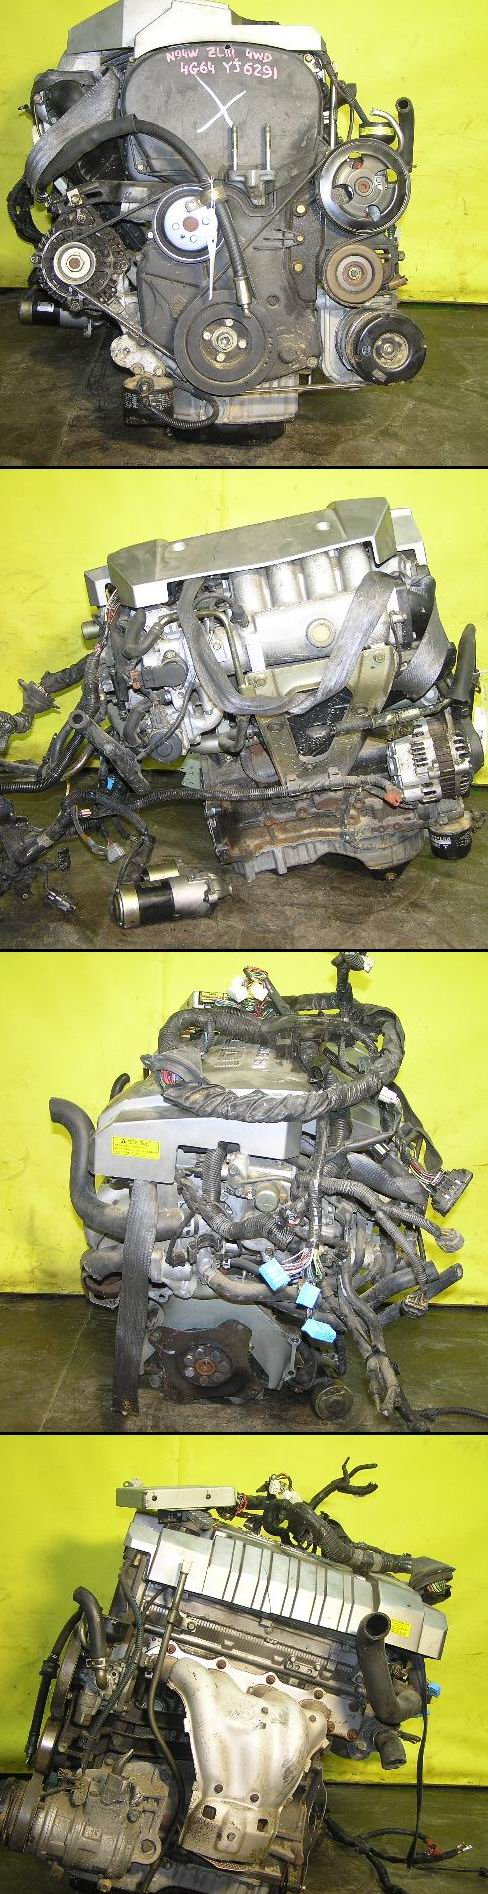 Двигатель бу Мицубиси 4G64 (N94W)